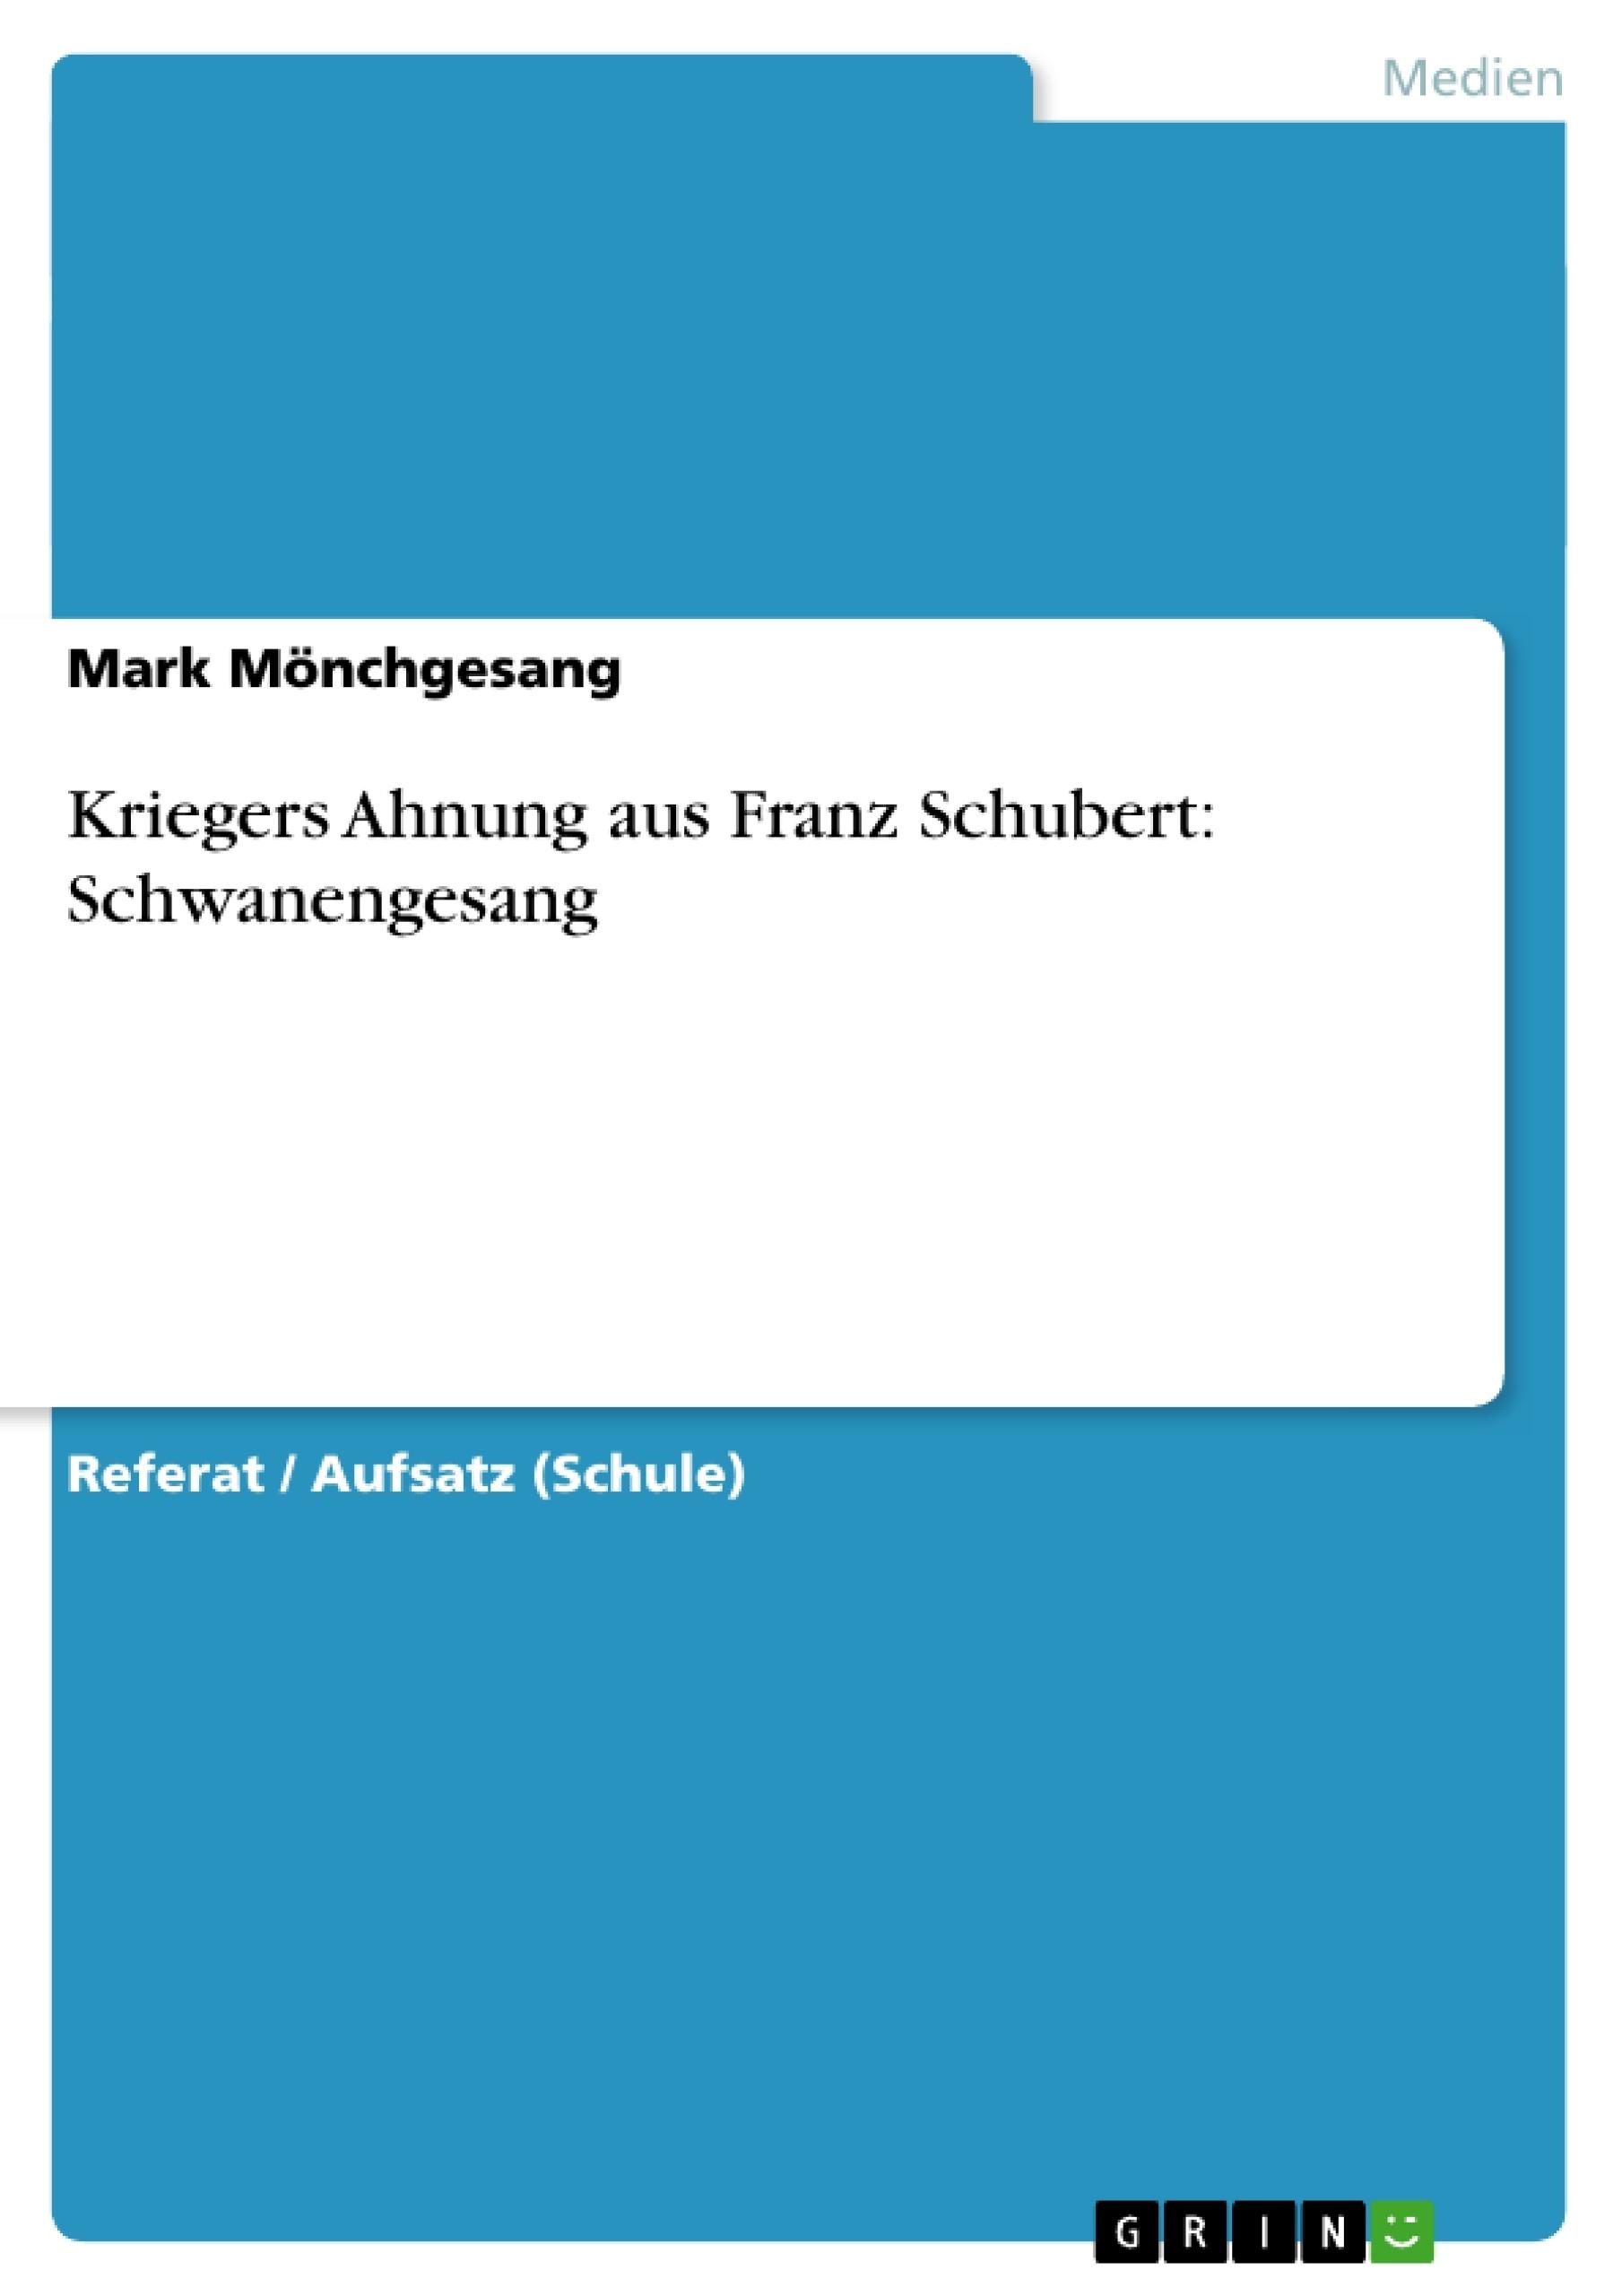 Titel: Kriegers Ahnung aus Franz Schubert: Schwanengesang